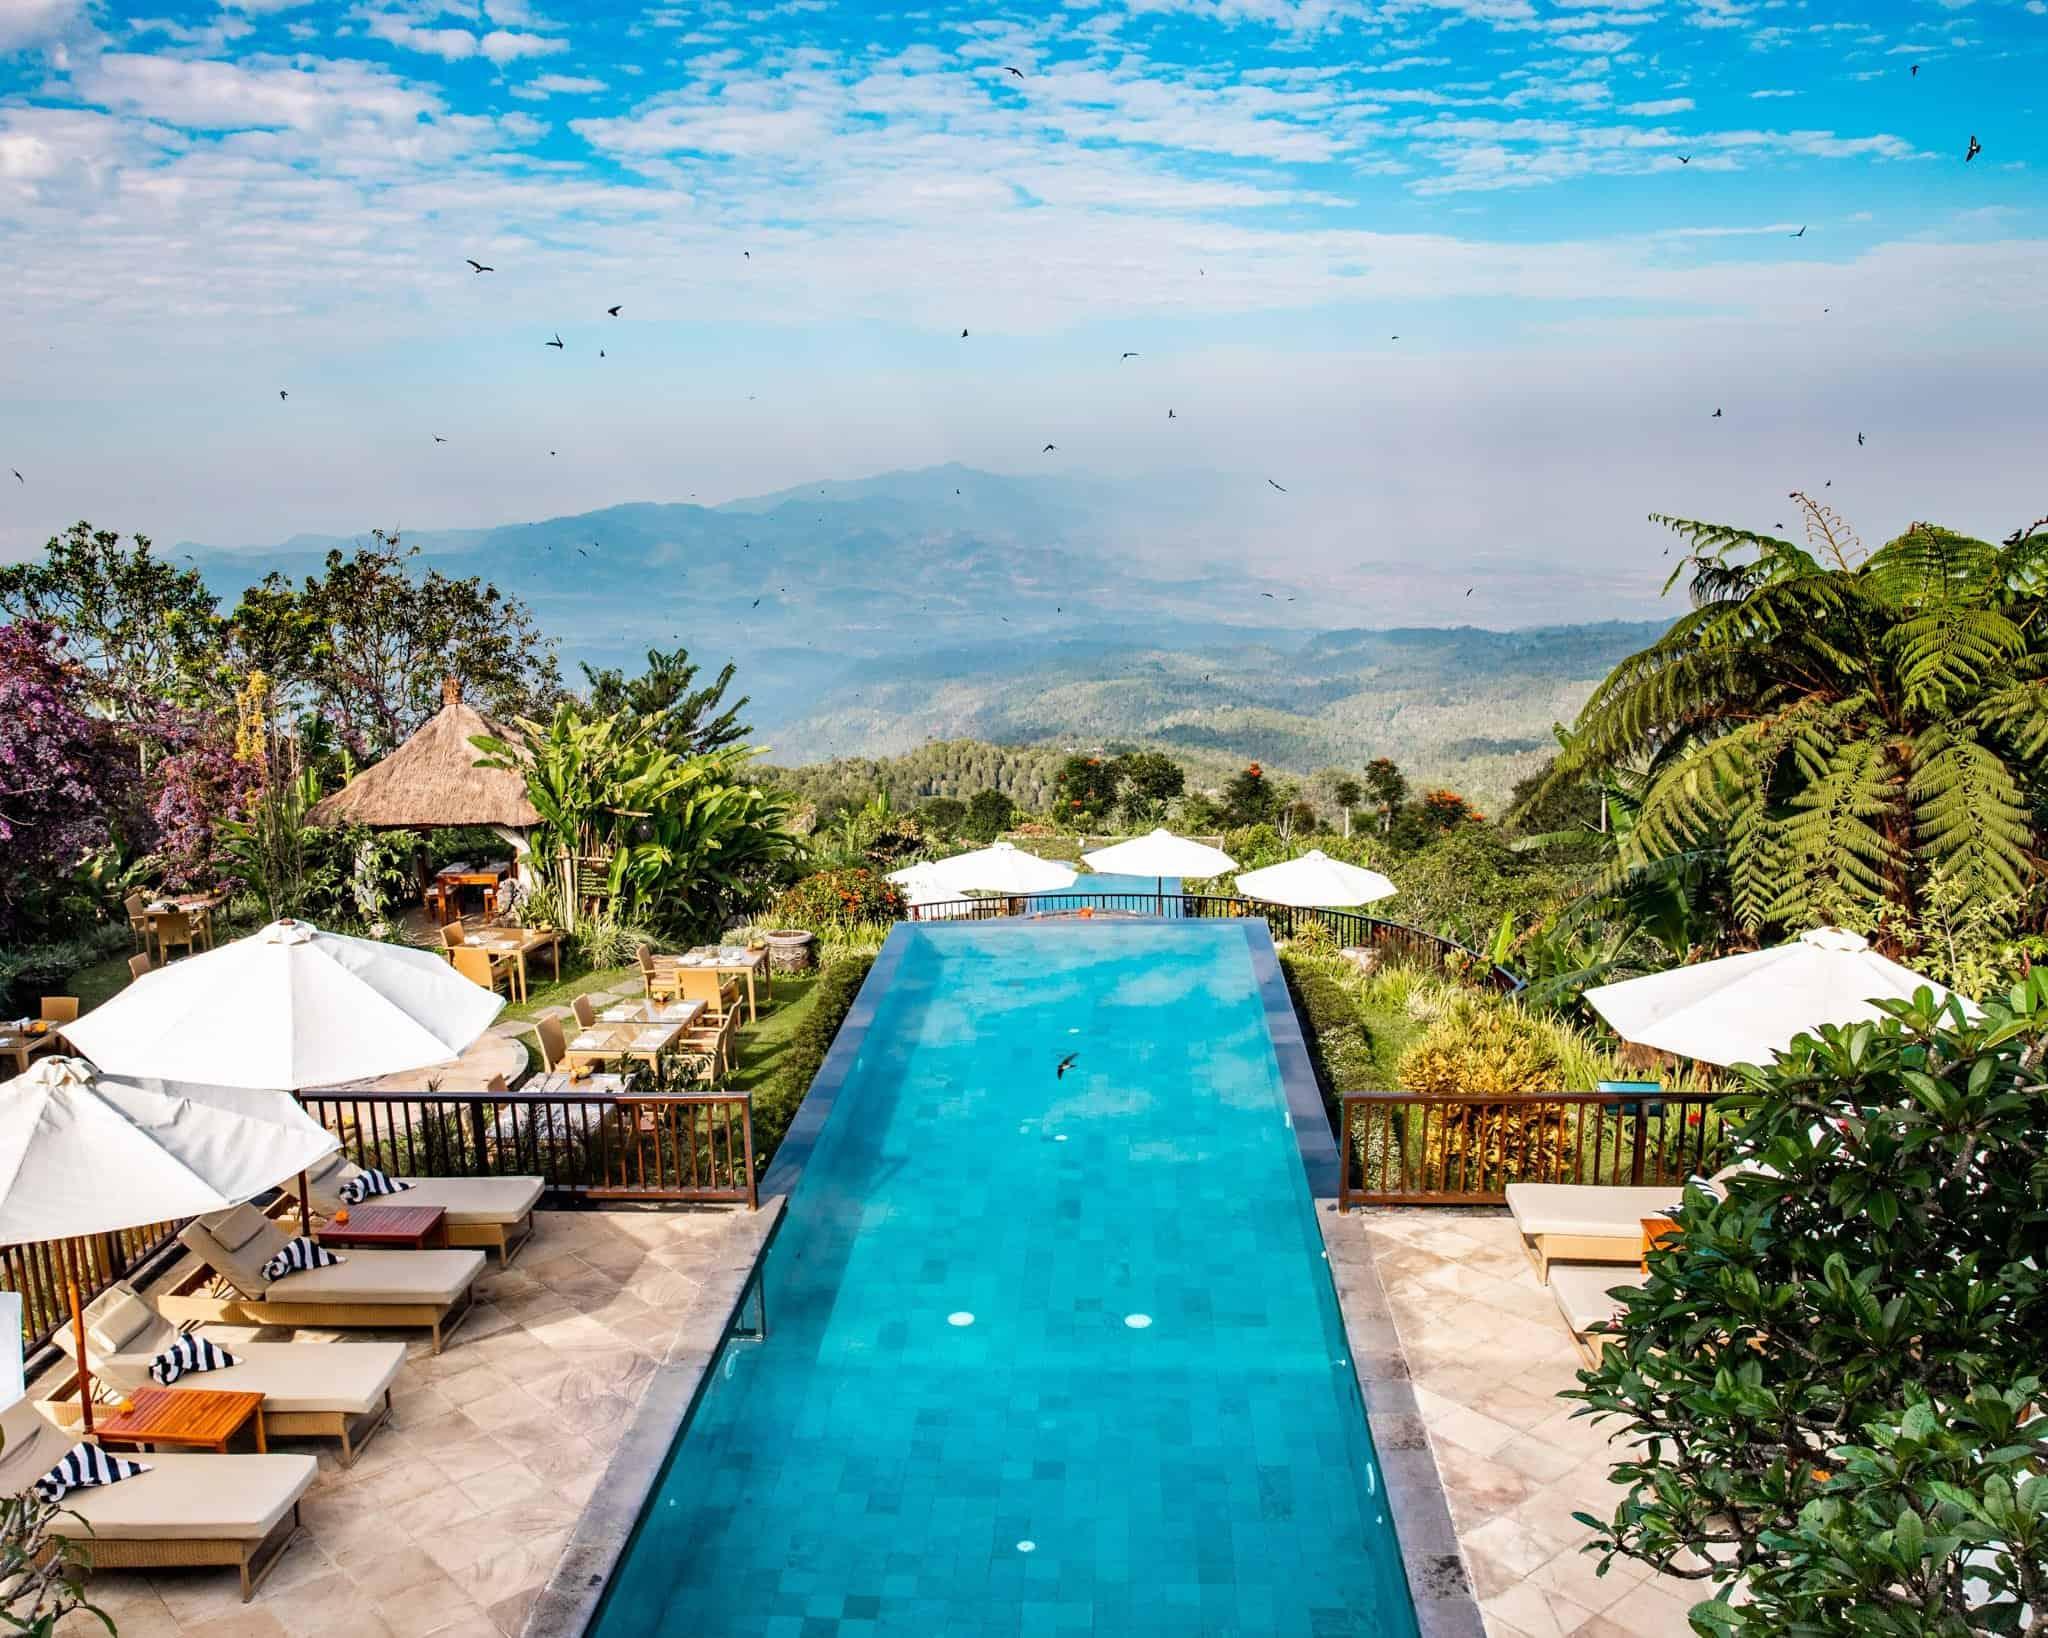 Infinity Pool at Munduk Moding Plantation Bali - The Next Trip